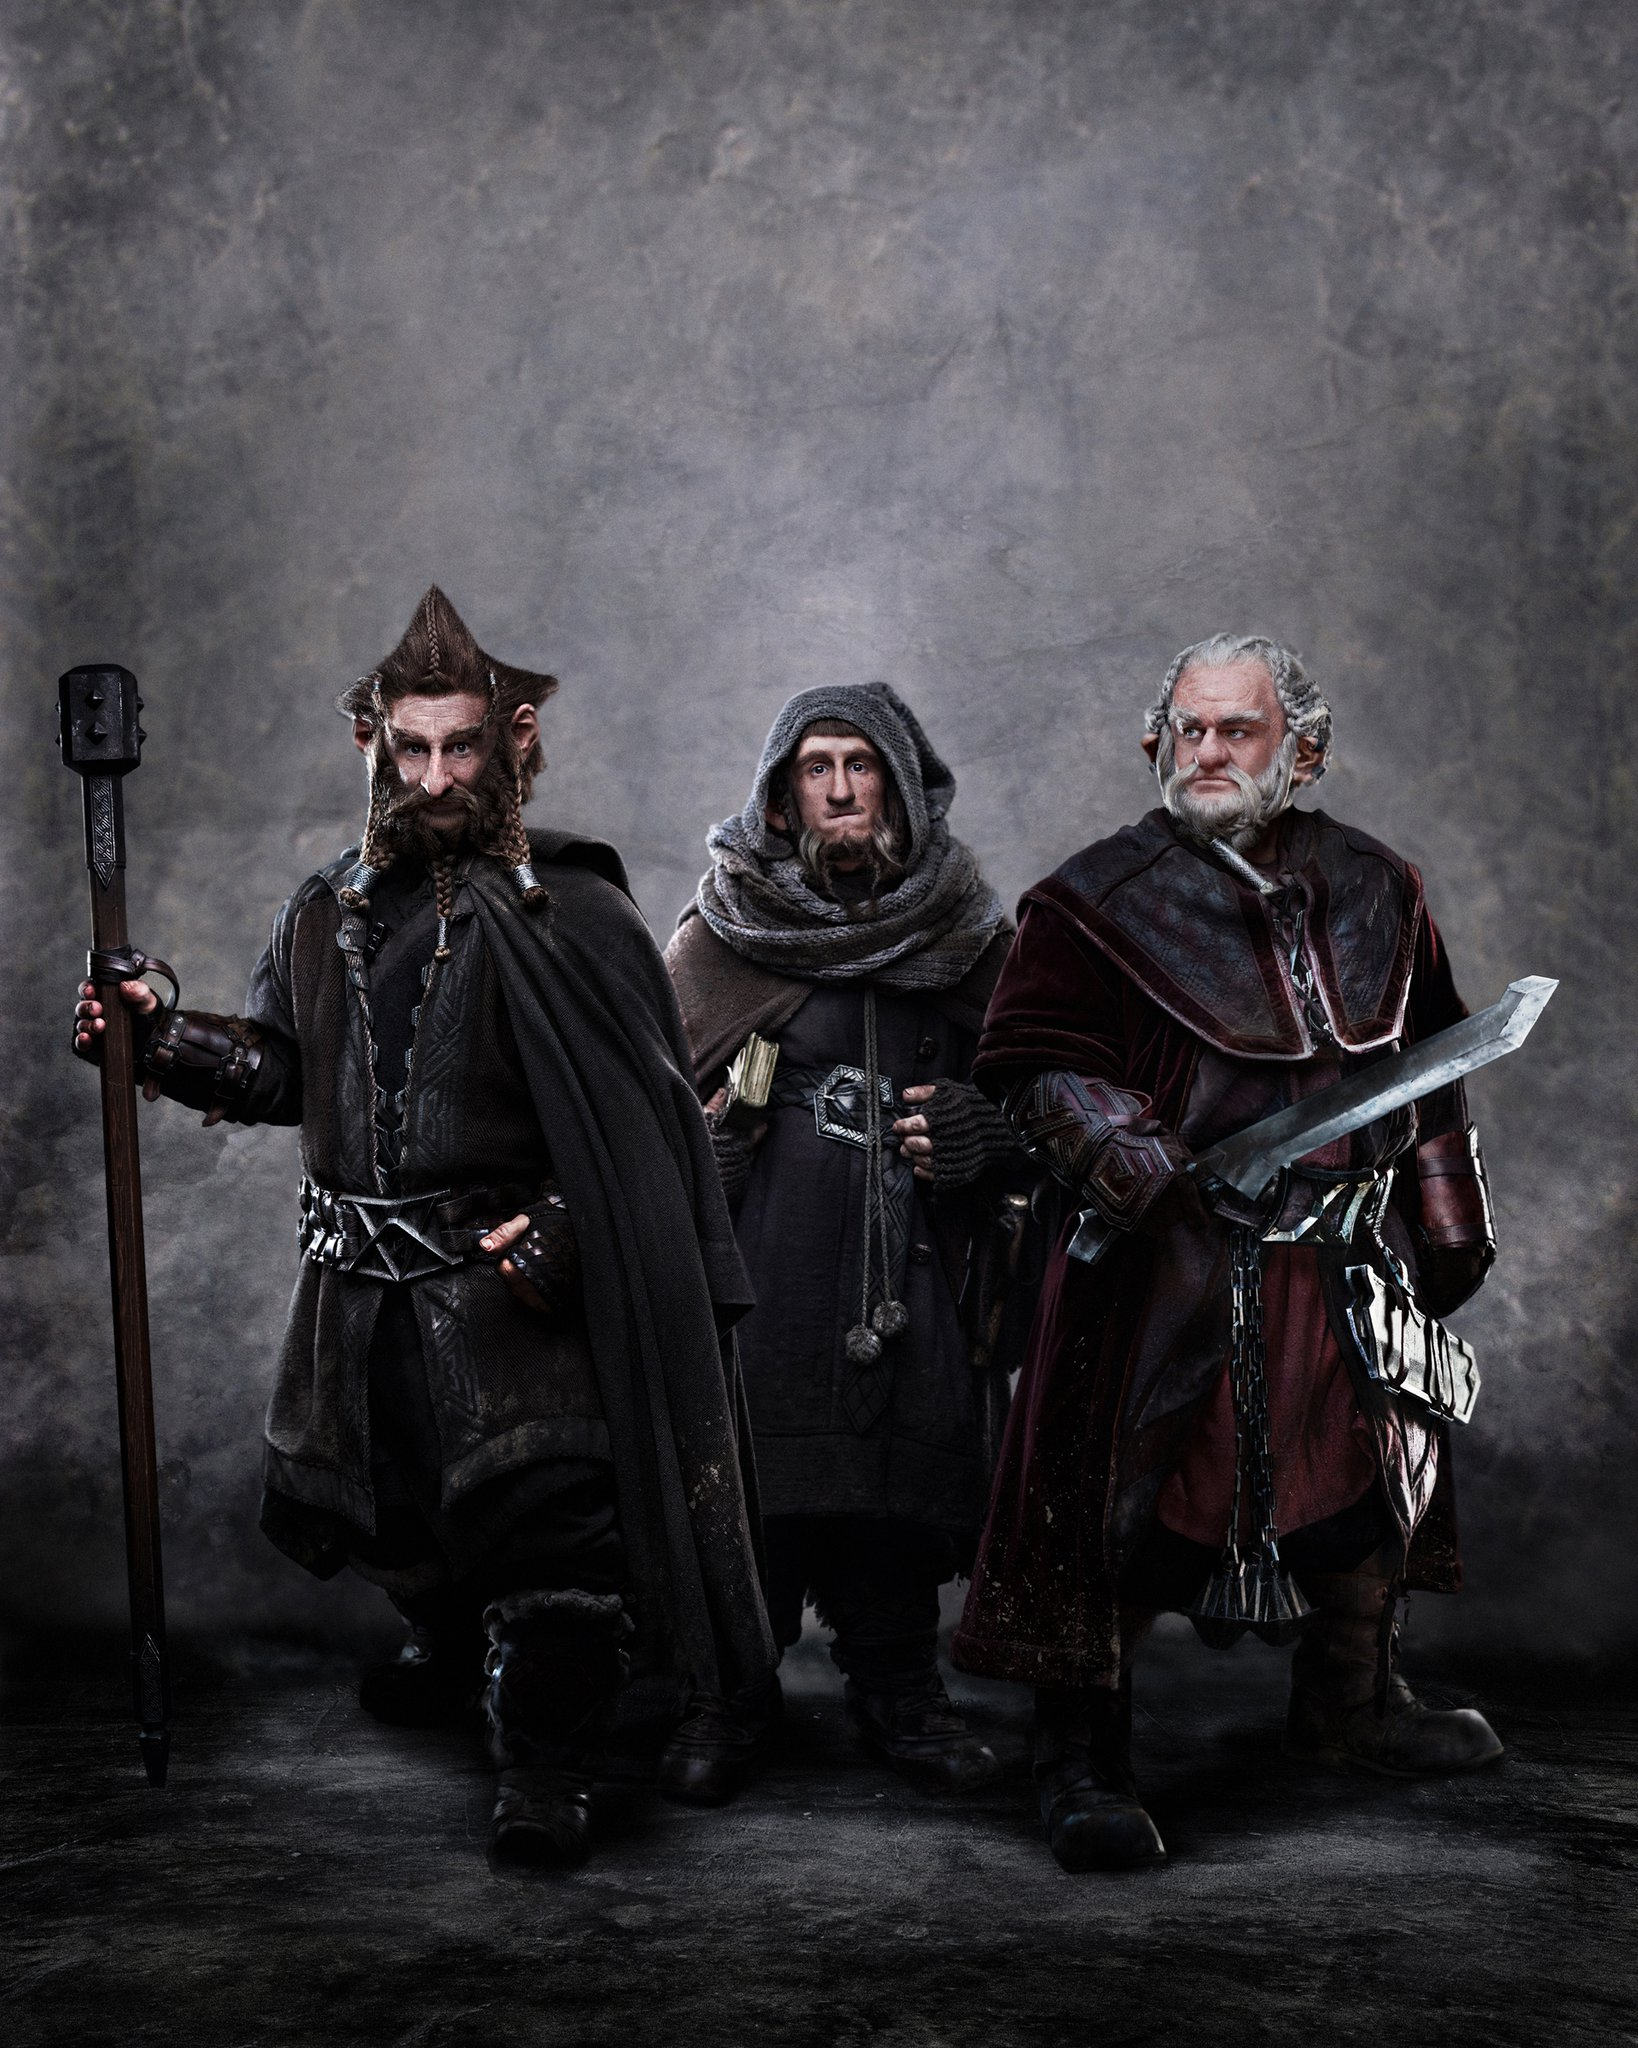 http://collider.com/wp-content/uploads/hobbit-movie-image-dwarves-nori-ori-dori-01.jpg